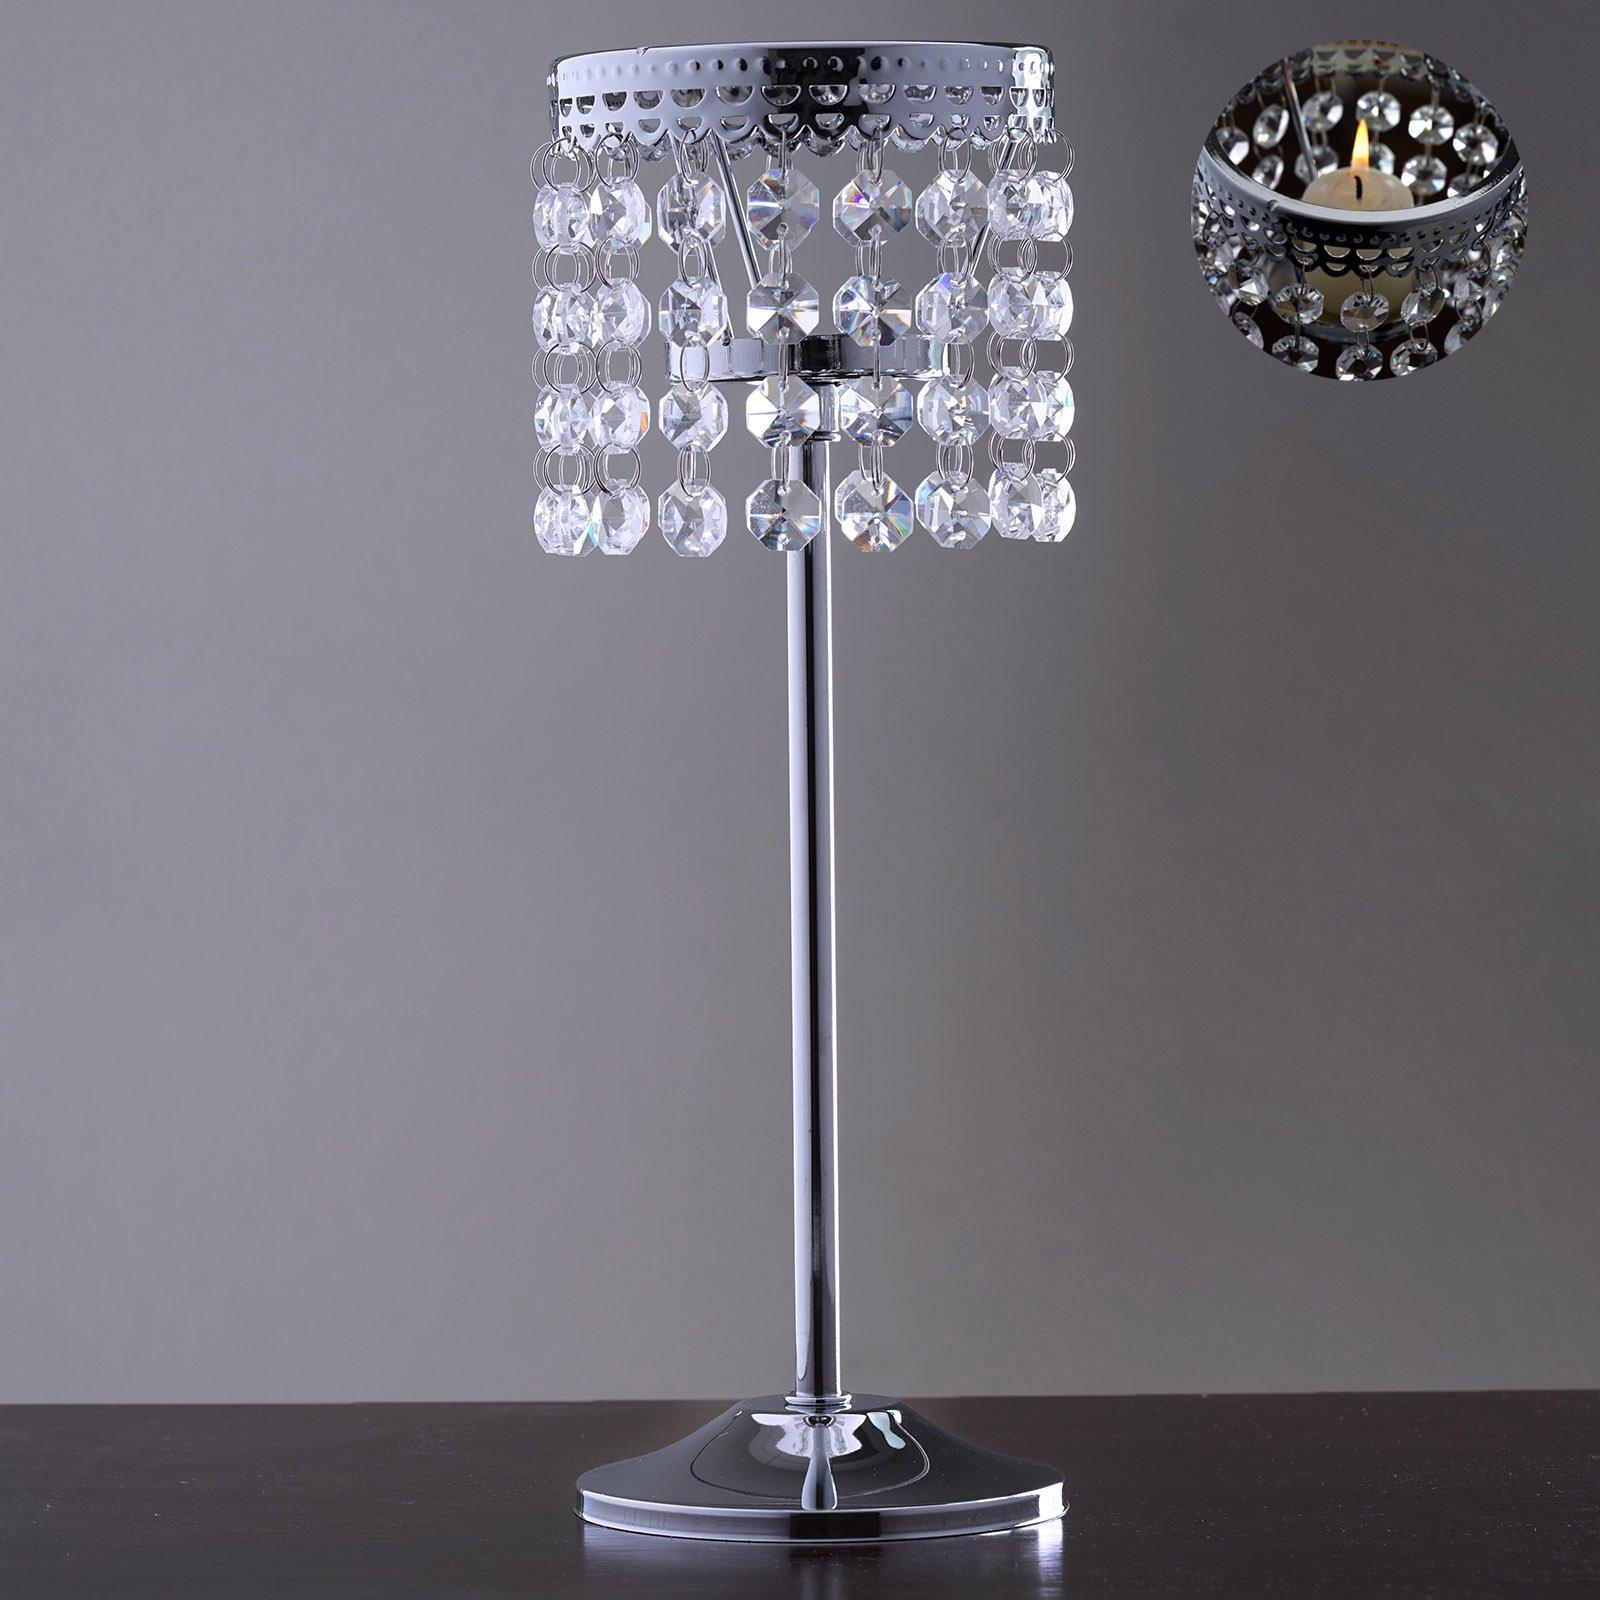 Efavormart Stunning Metal Votive Tealight Crystal Candle Holder Wedding Centerpiece - 11.5''